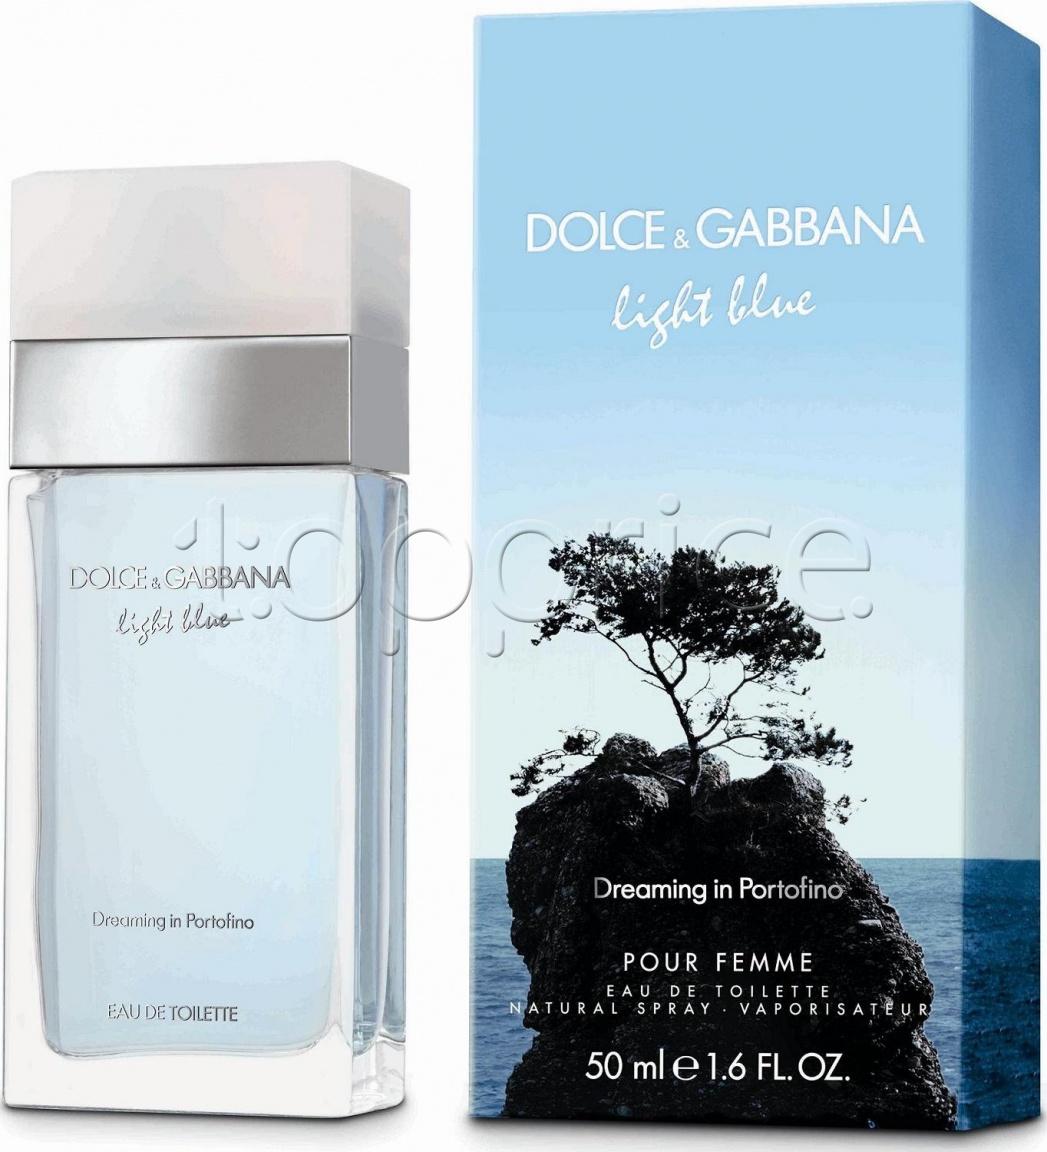 dolce gabbana light blue dreaming in portofino edt 50 ml. Black Bedroom Furniture Sets. Home Design Ideas